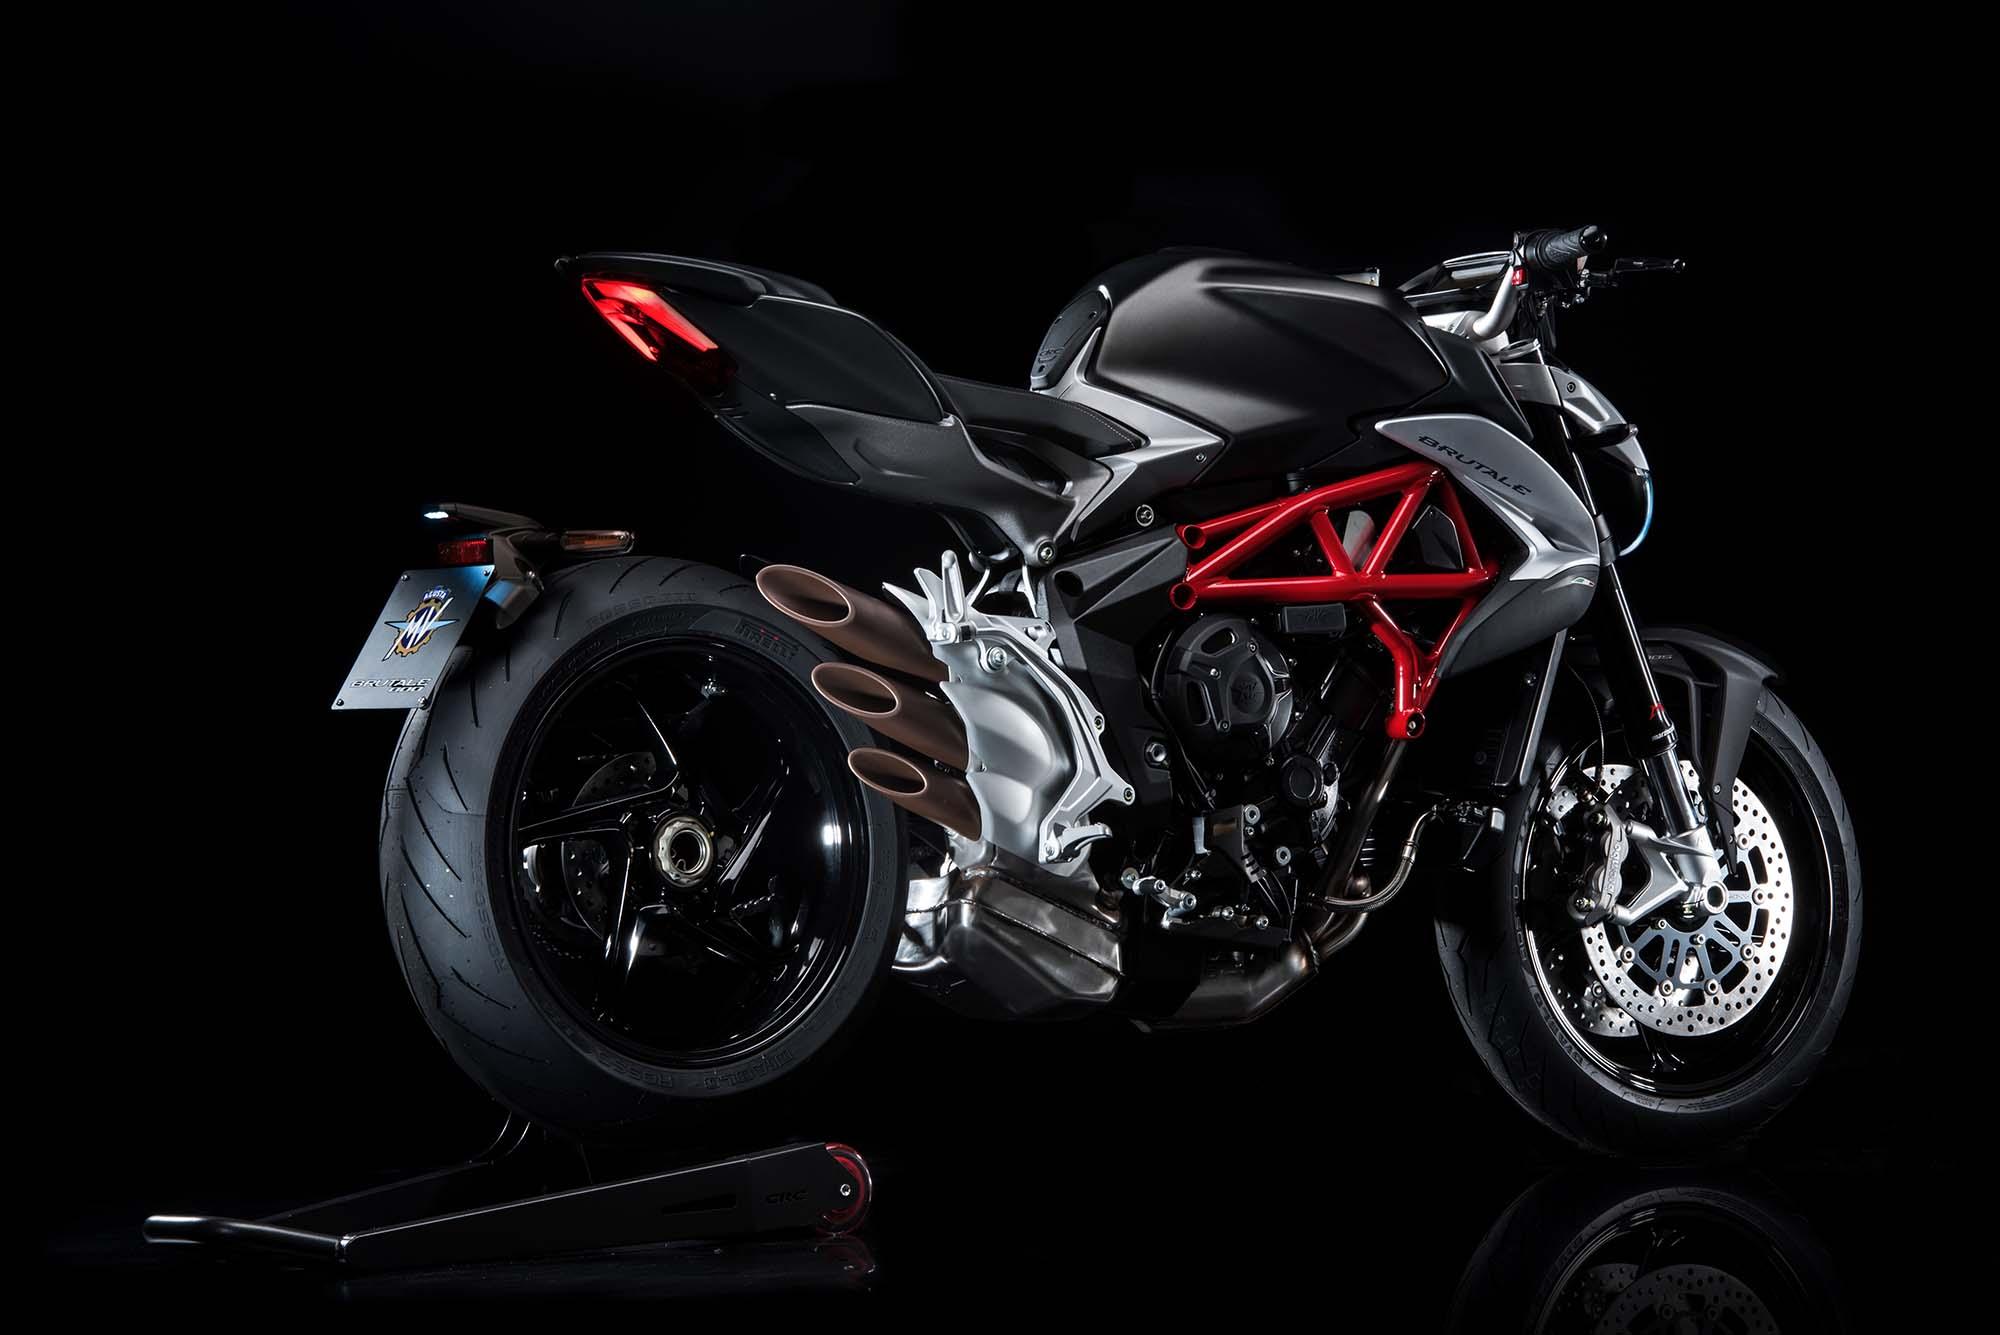 Wallpaper Mv Agusta Brutale 800 2017 Automotive Bikes: 2016 MV Agusta Brutale 800